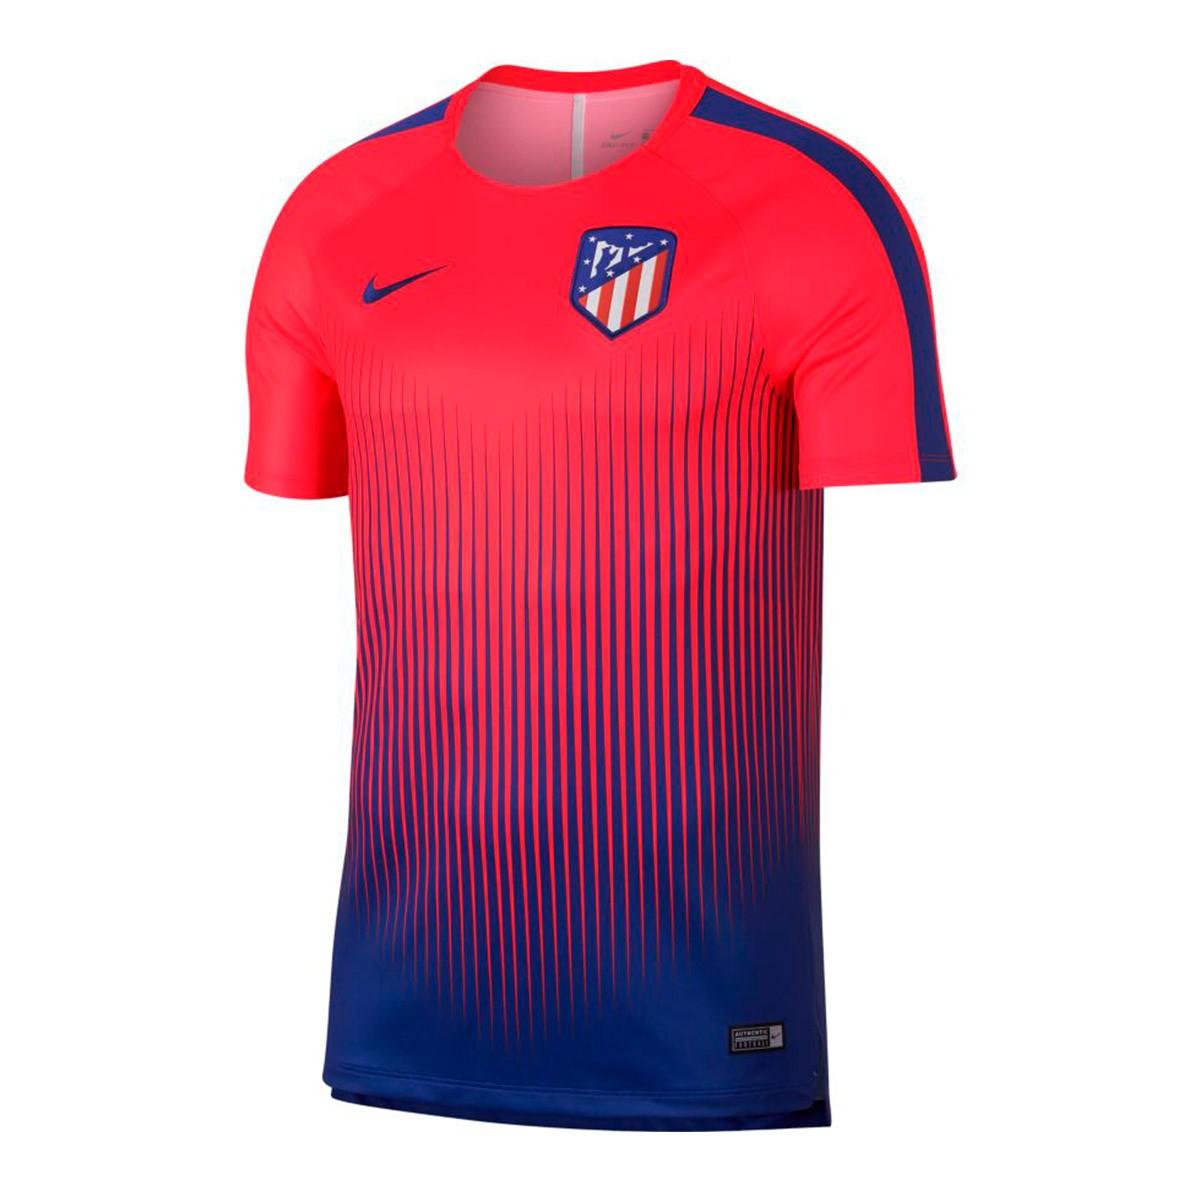 5f5f0f6710c86 Jersey Nike Atlético de Madrid Squad 2018-2019 Bright crimson-Deep ...